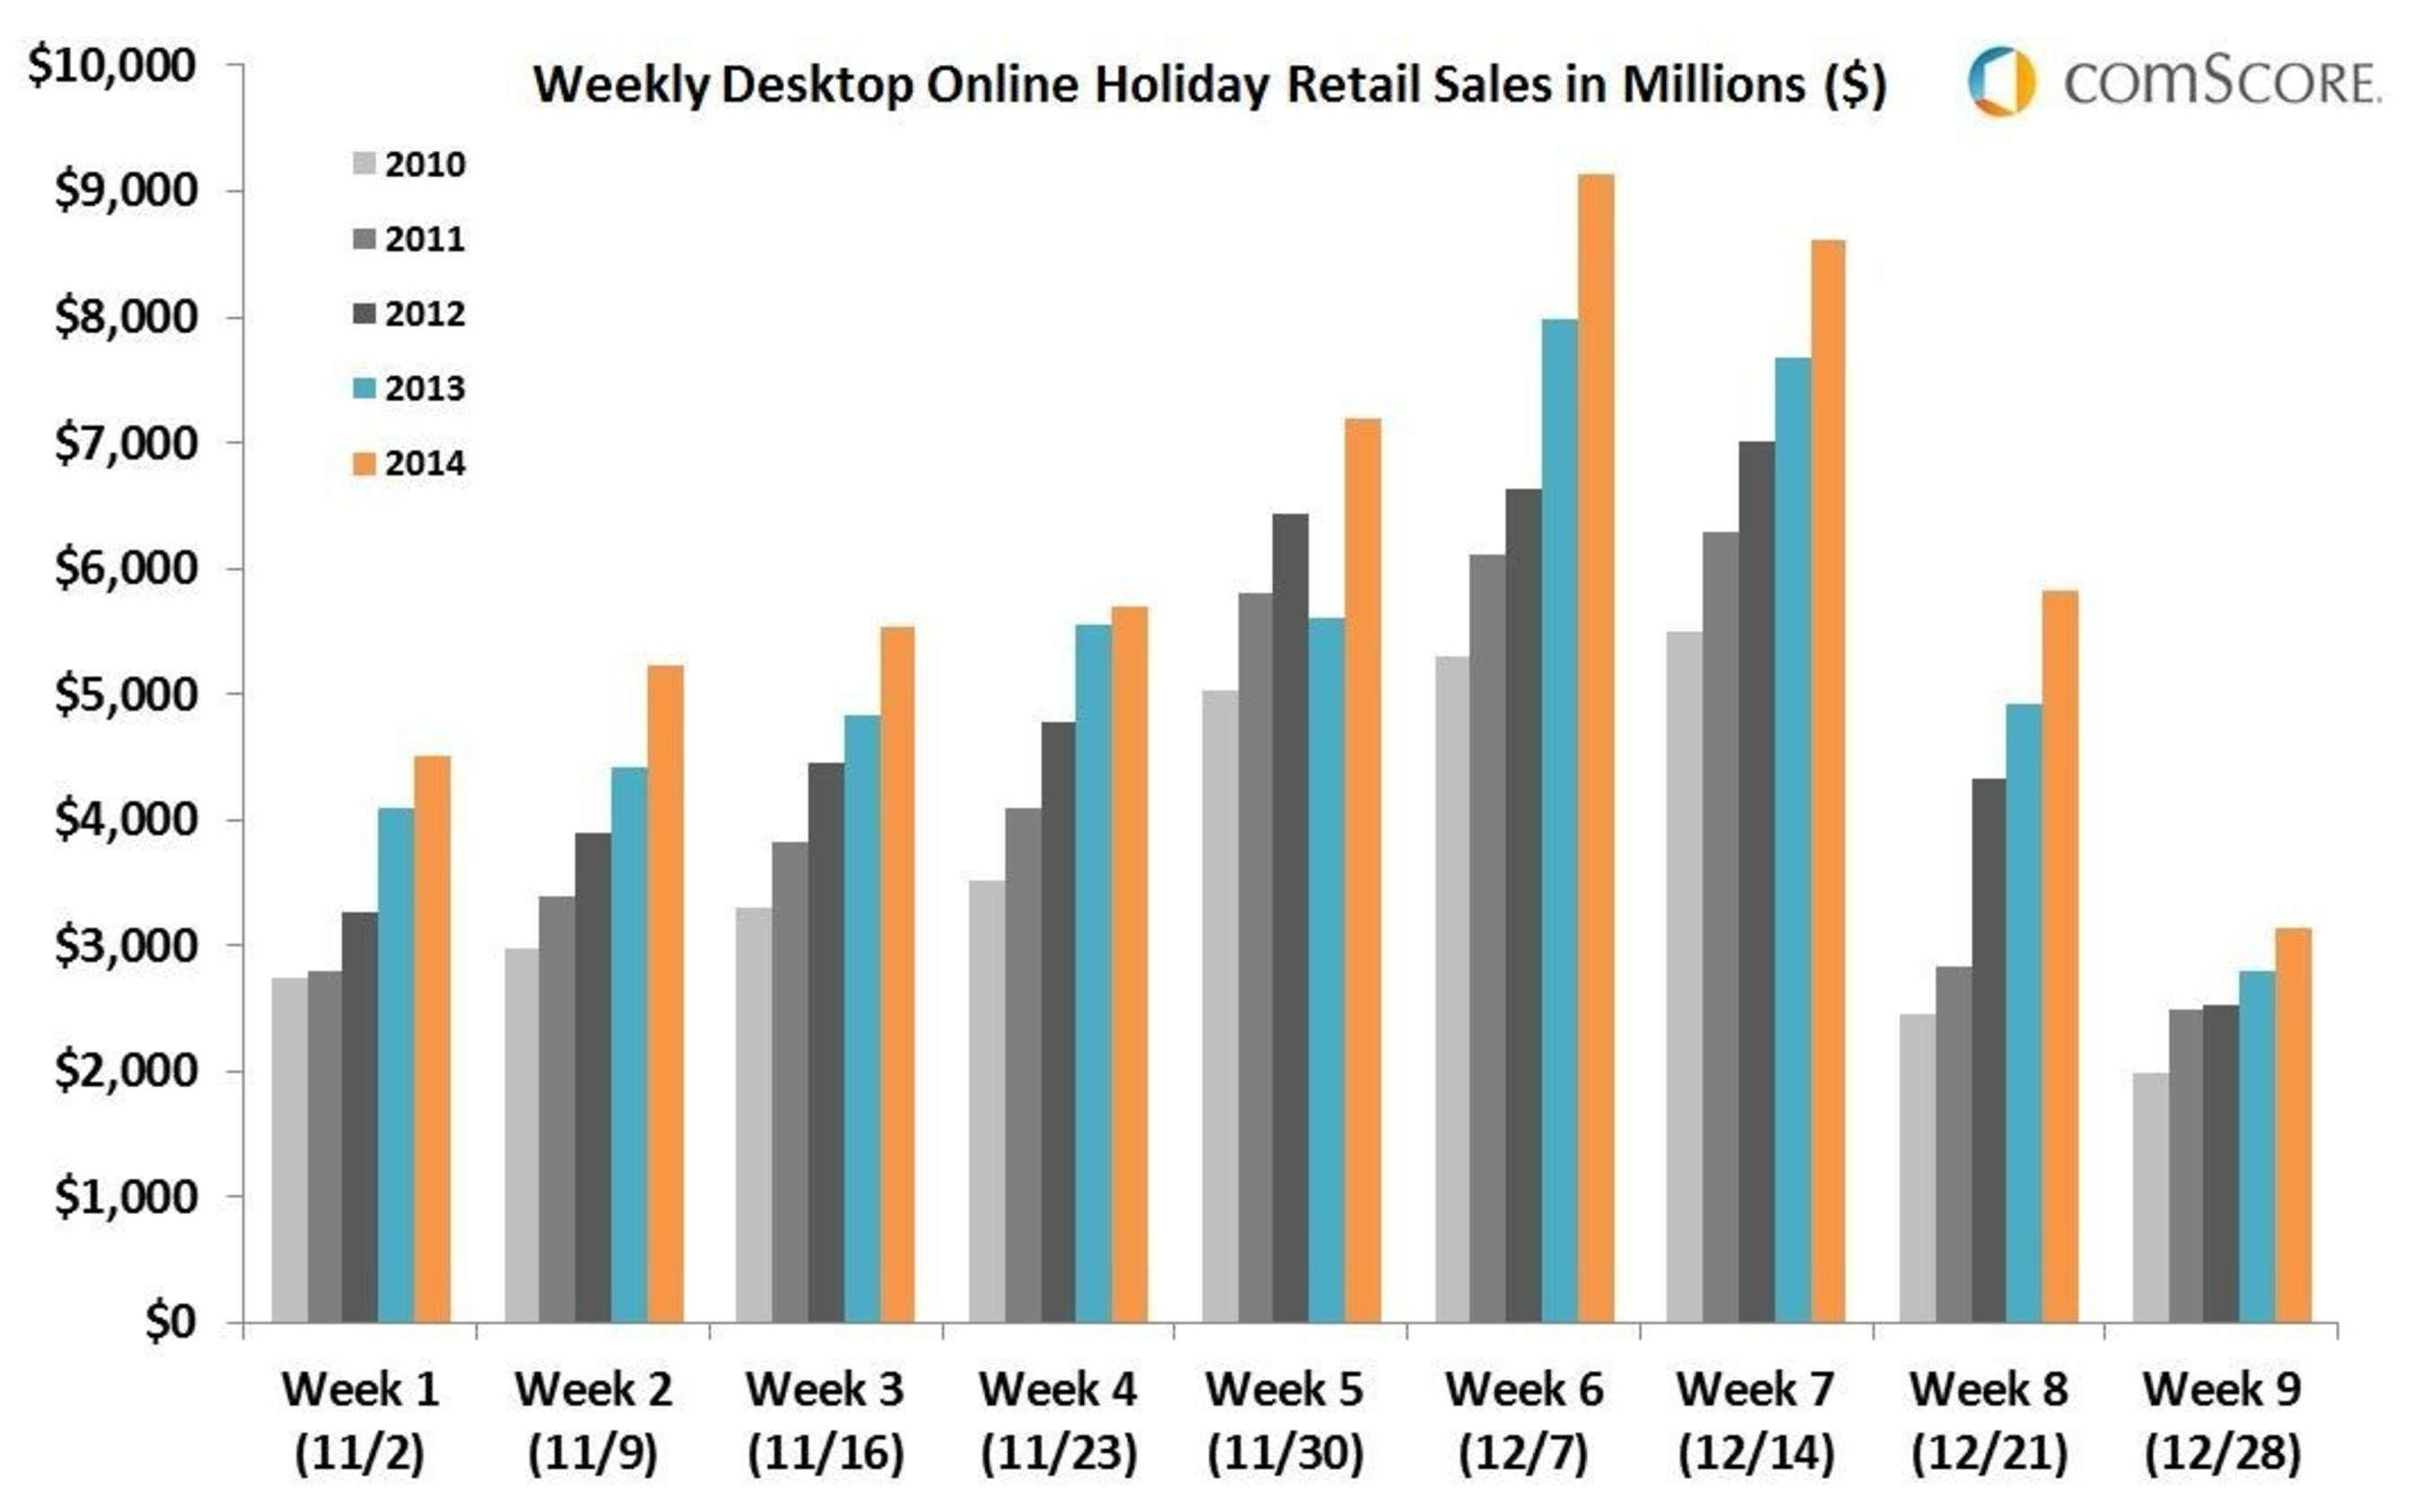 Online desktop retail sales were up each week of the 2014 holiday season vs. year ago